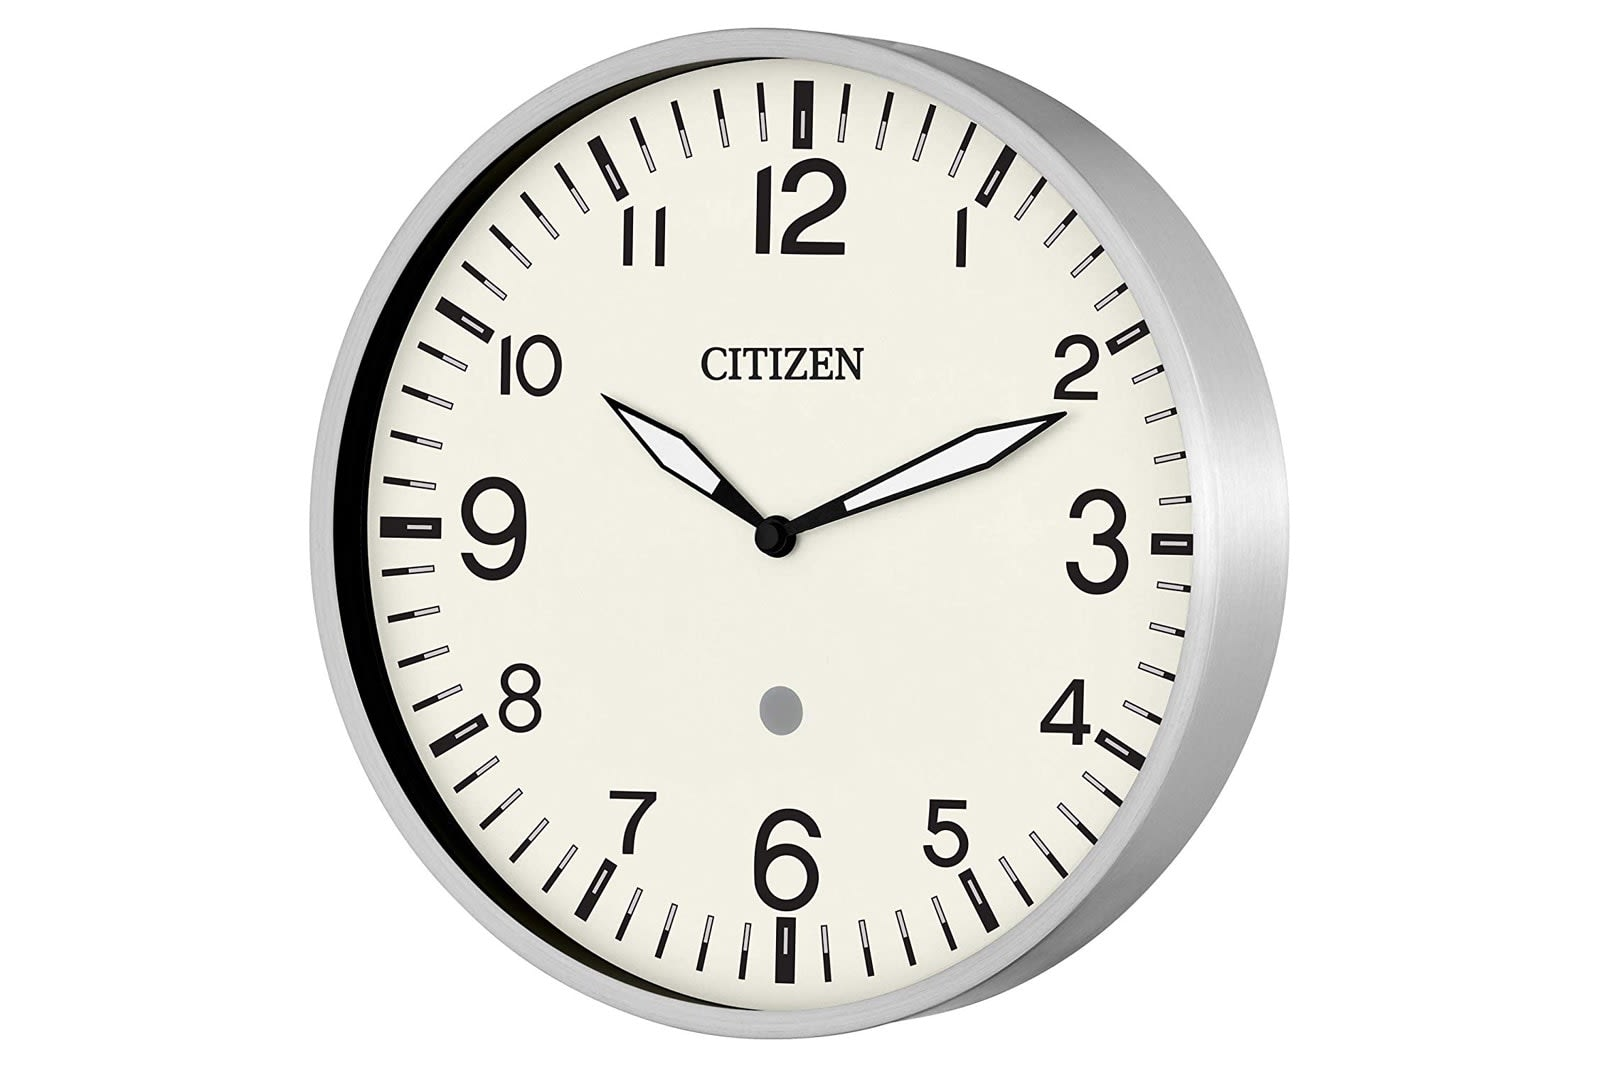 Citizen has a fancier alternative to Amazon's Alexa wall clock